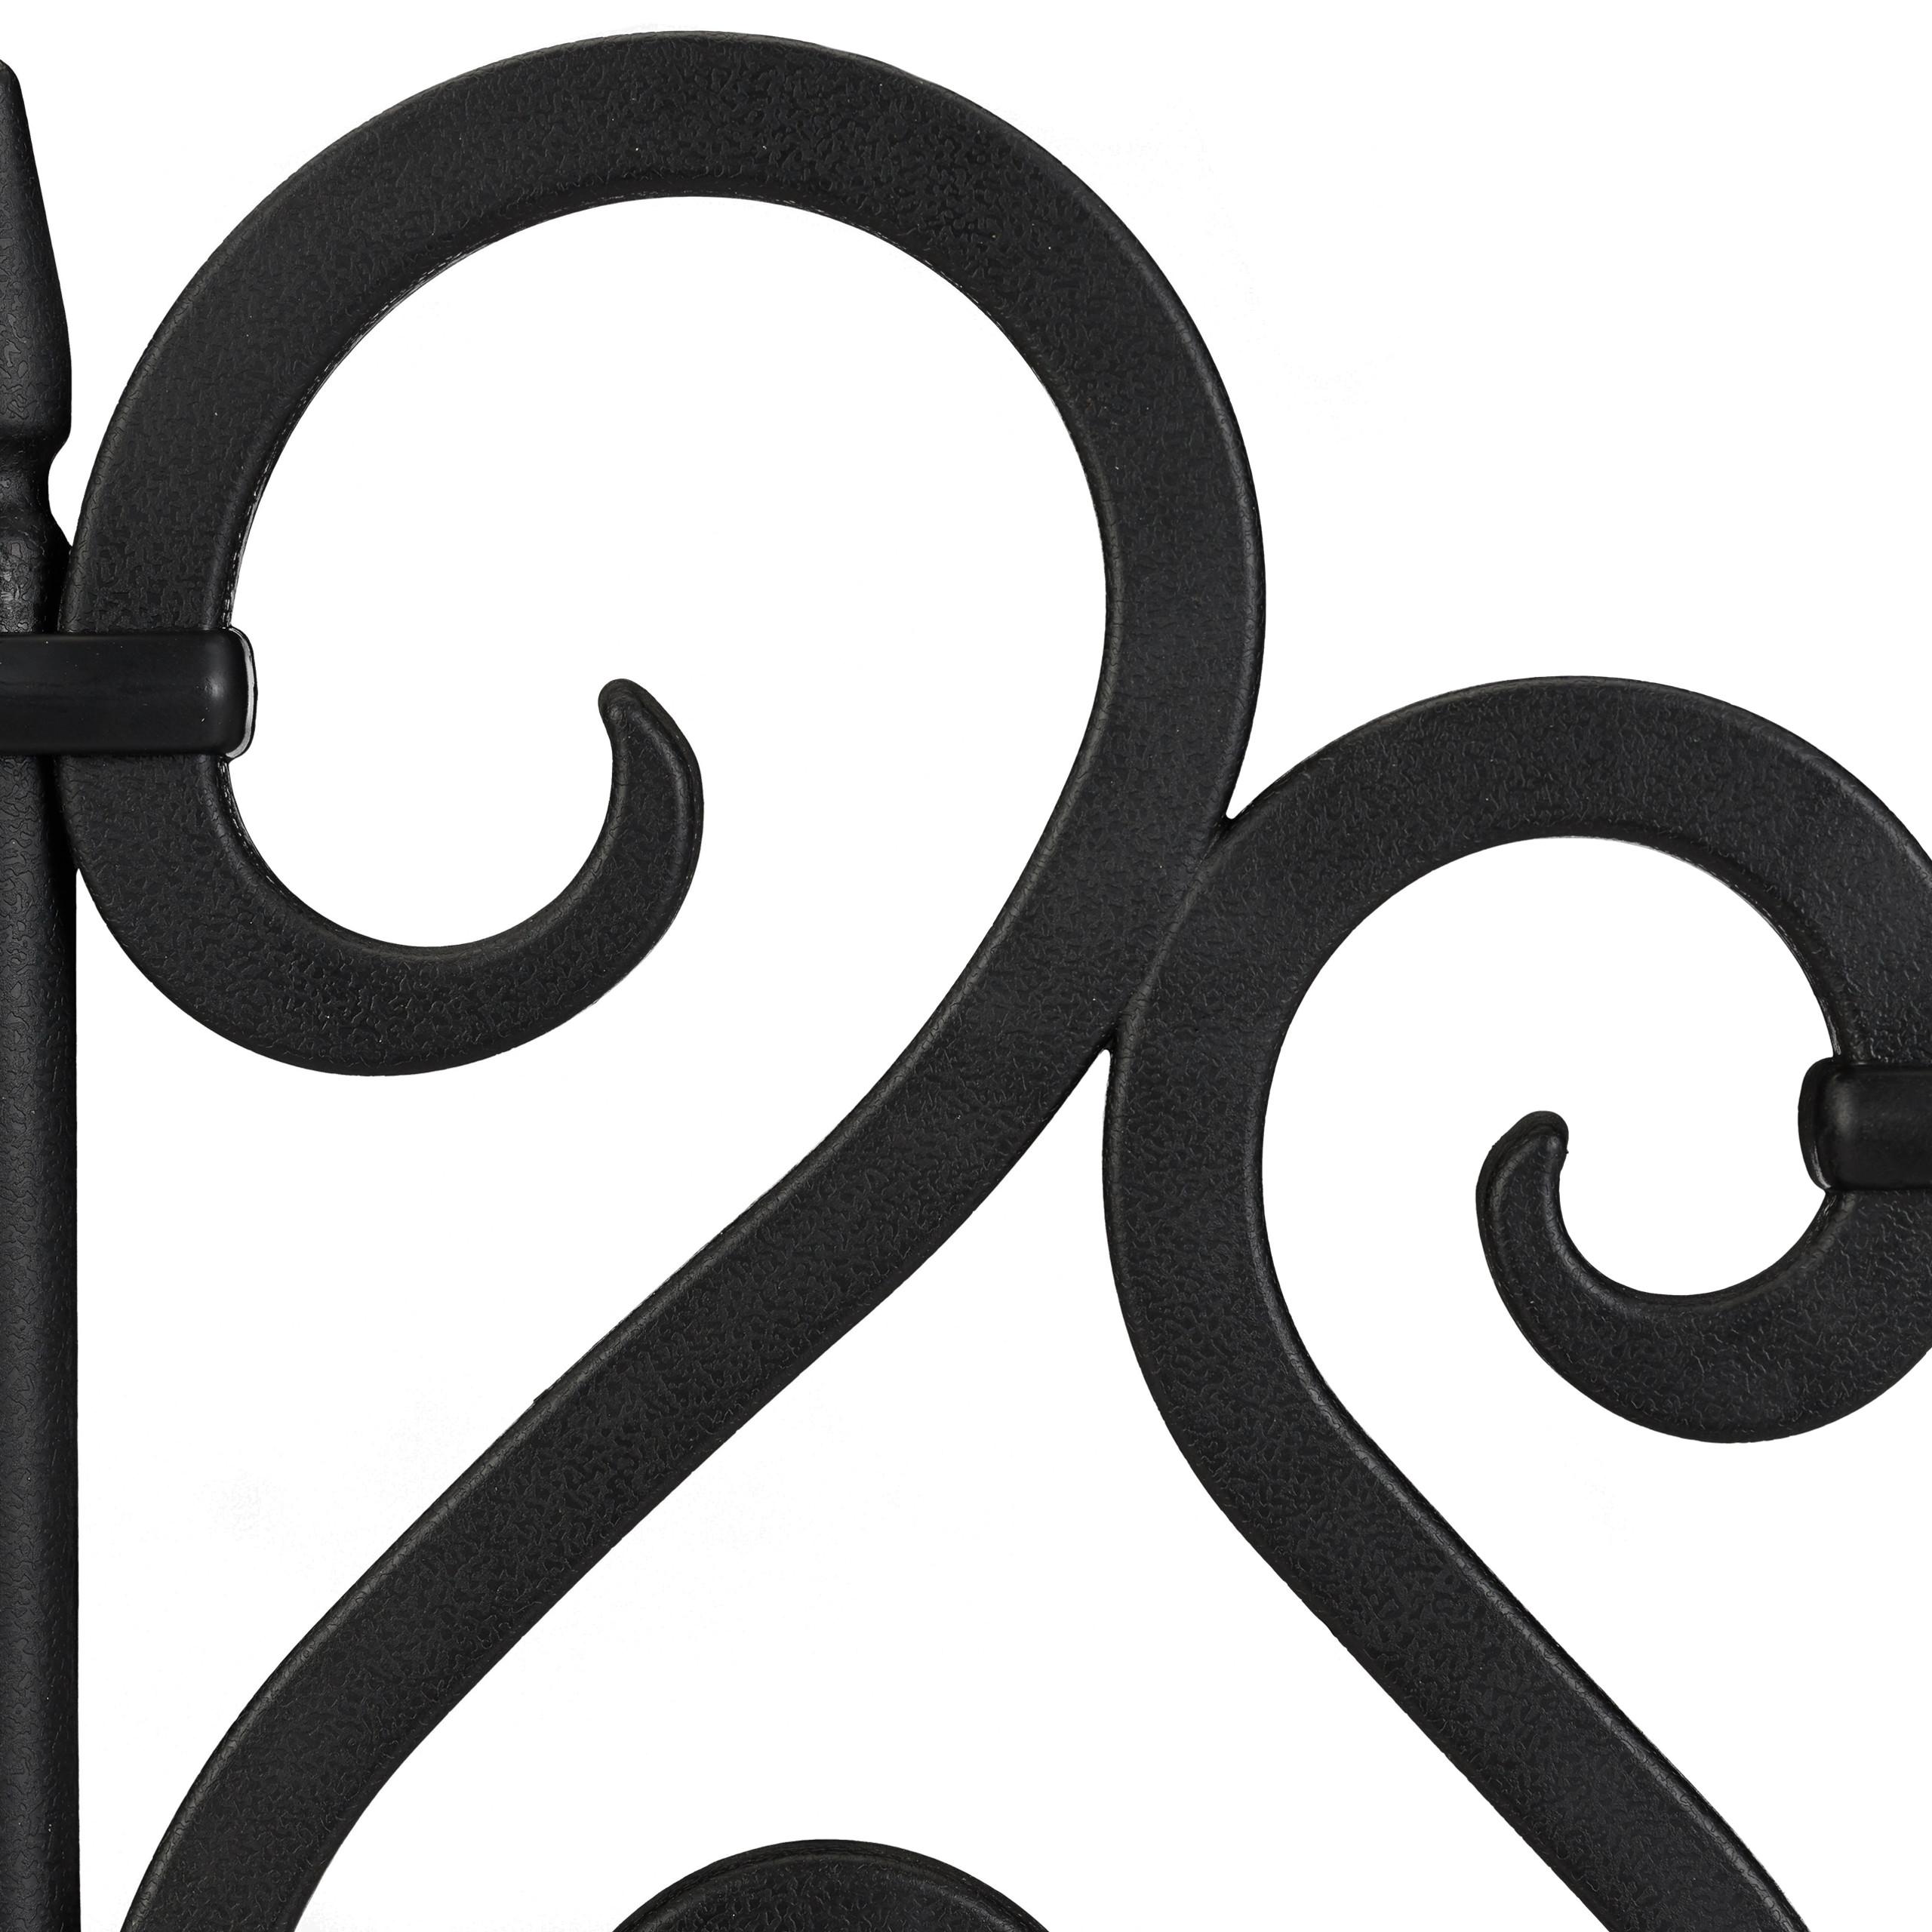 Valla-jardin-Borde-cesped-Bordillo-limitador-jardin-Set-4-separadores-cesped miniatura 16